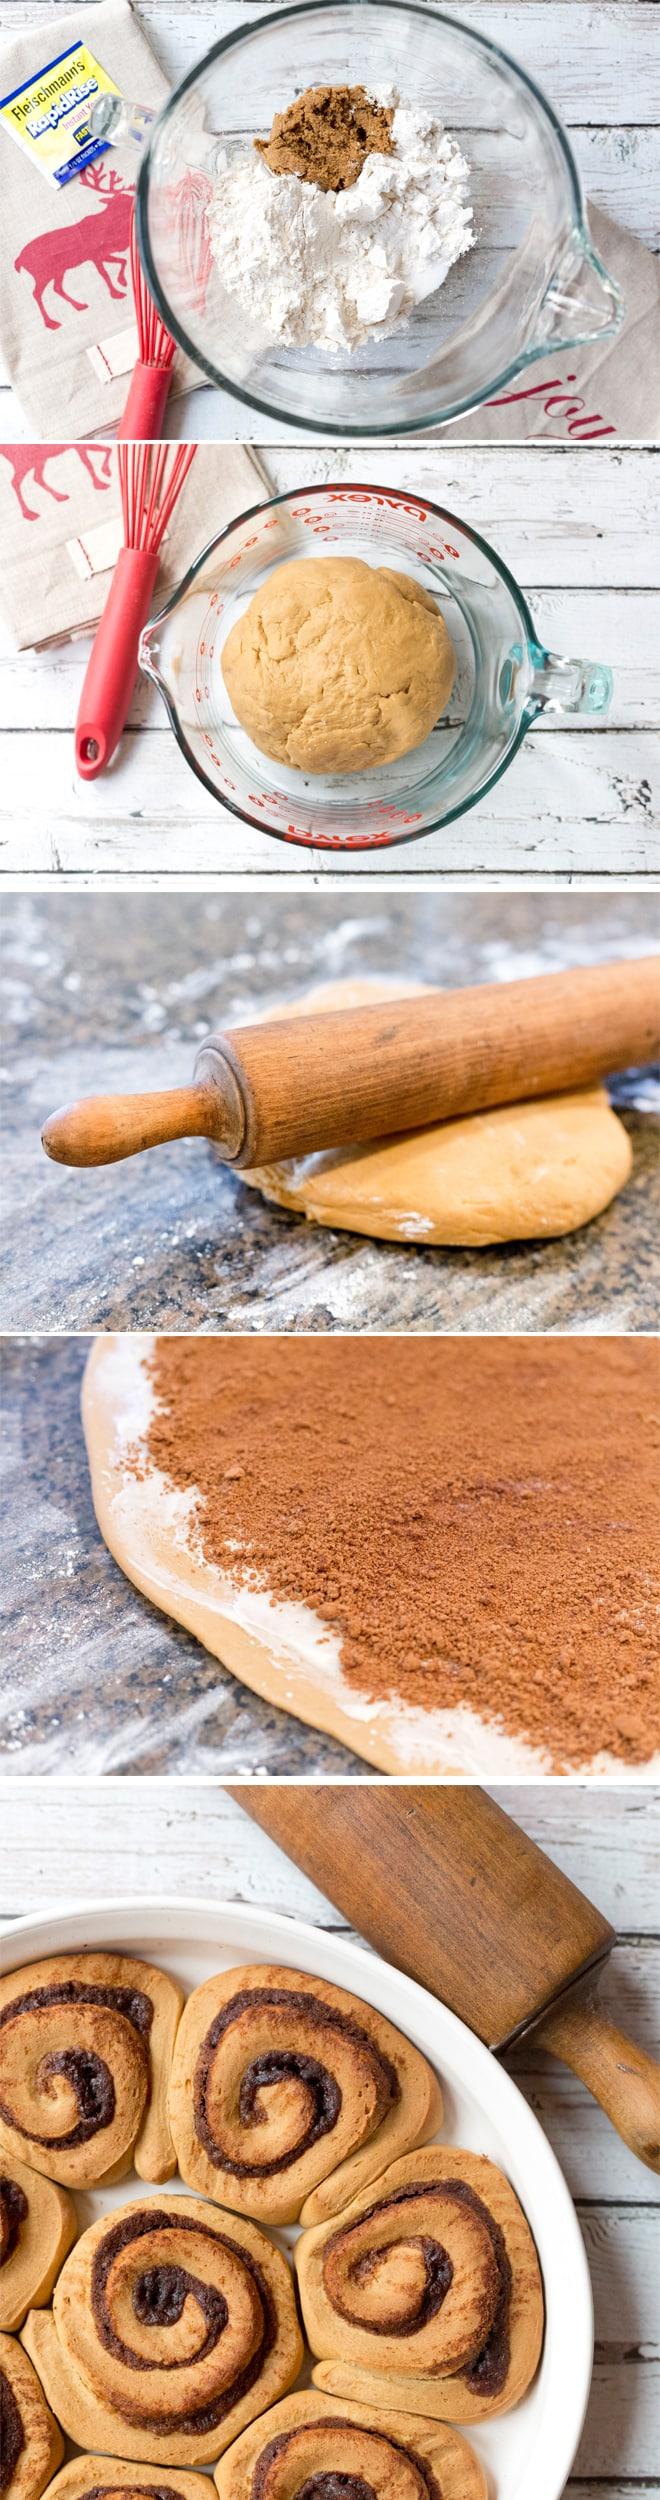 Easiest cinnamon roll recipe with a gingerbread twist! LOVE IT!